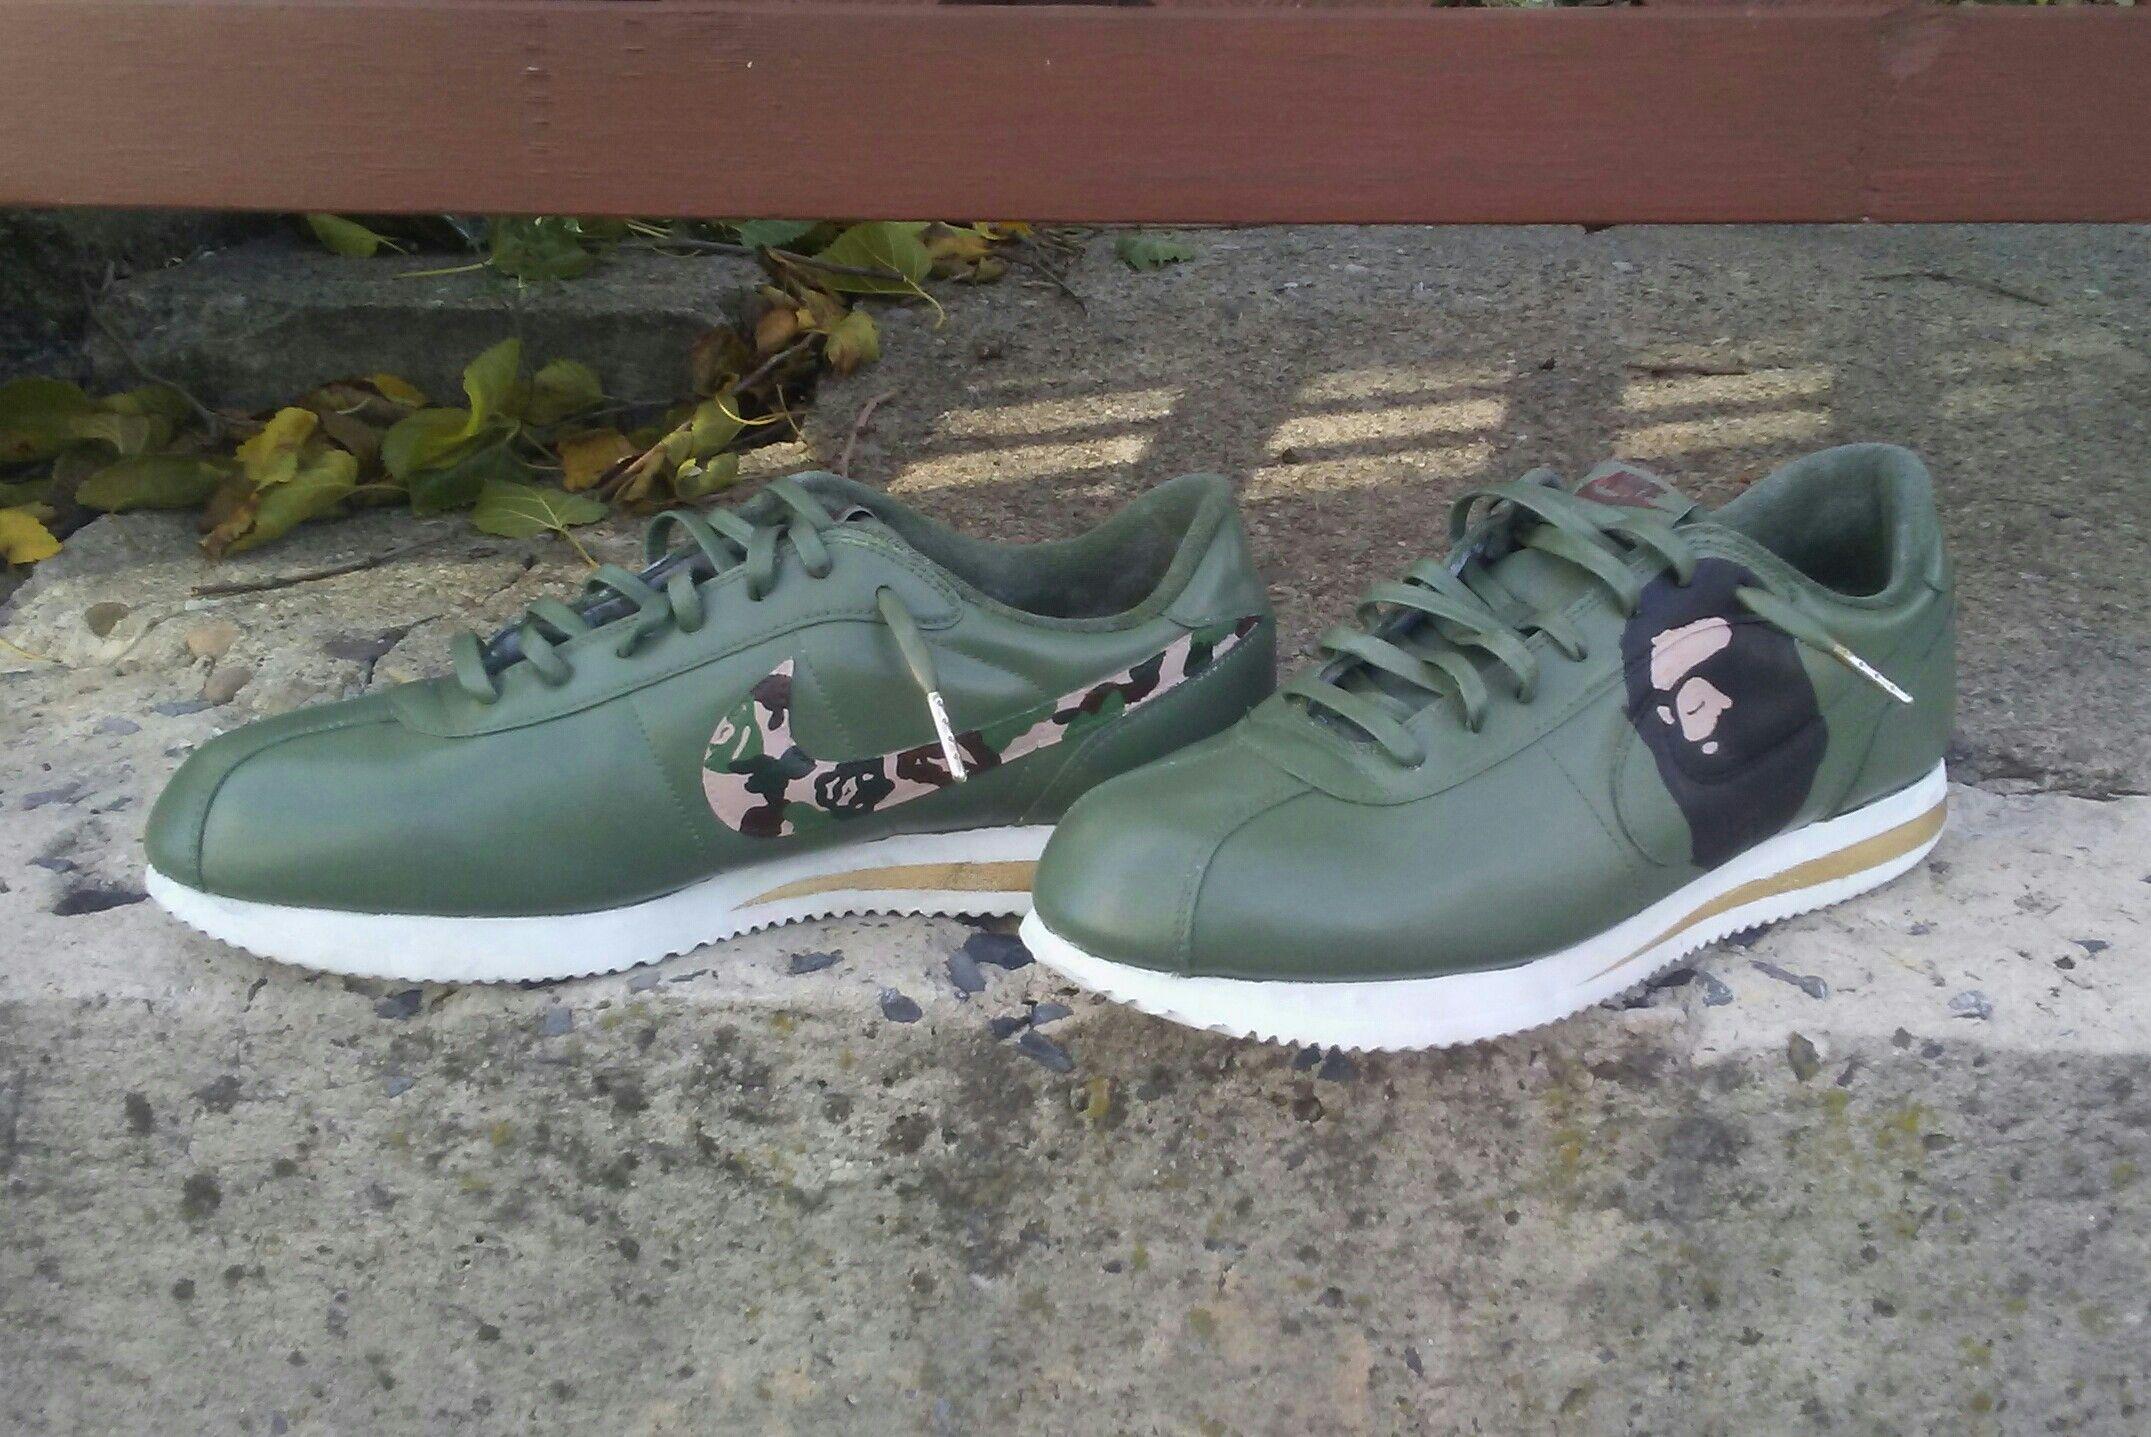 low priced a5a7b 2c43d Nike Cortez 'Bape' custom by @kyngred_kustomz on ig |